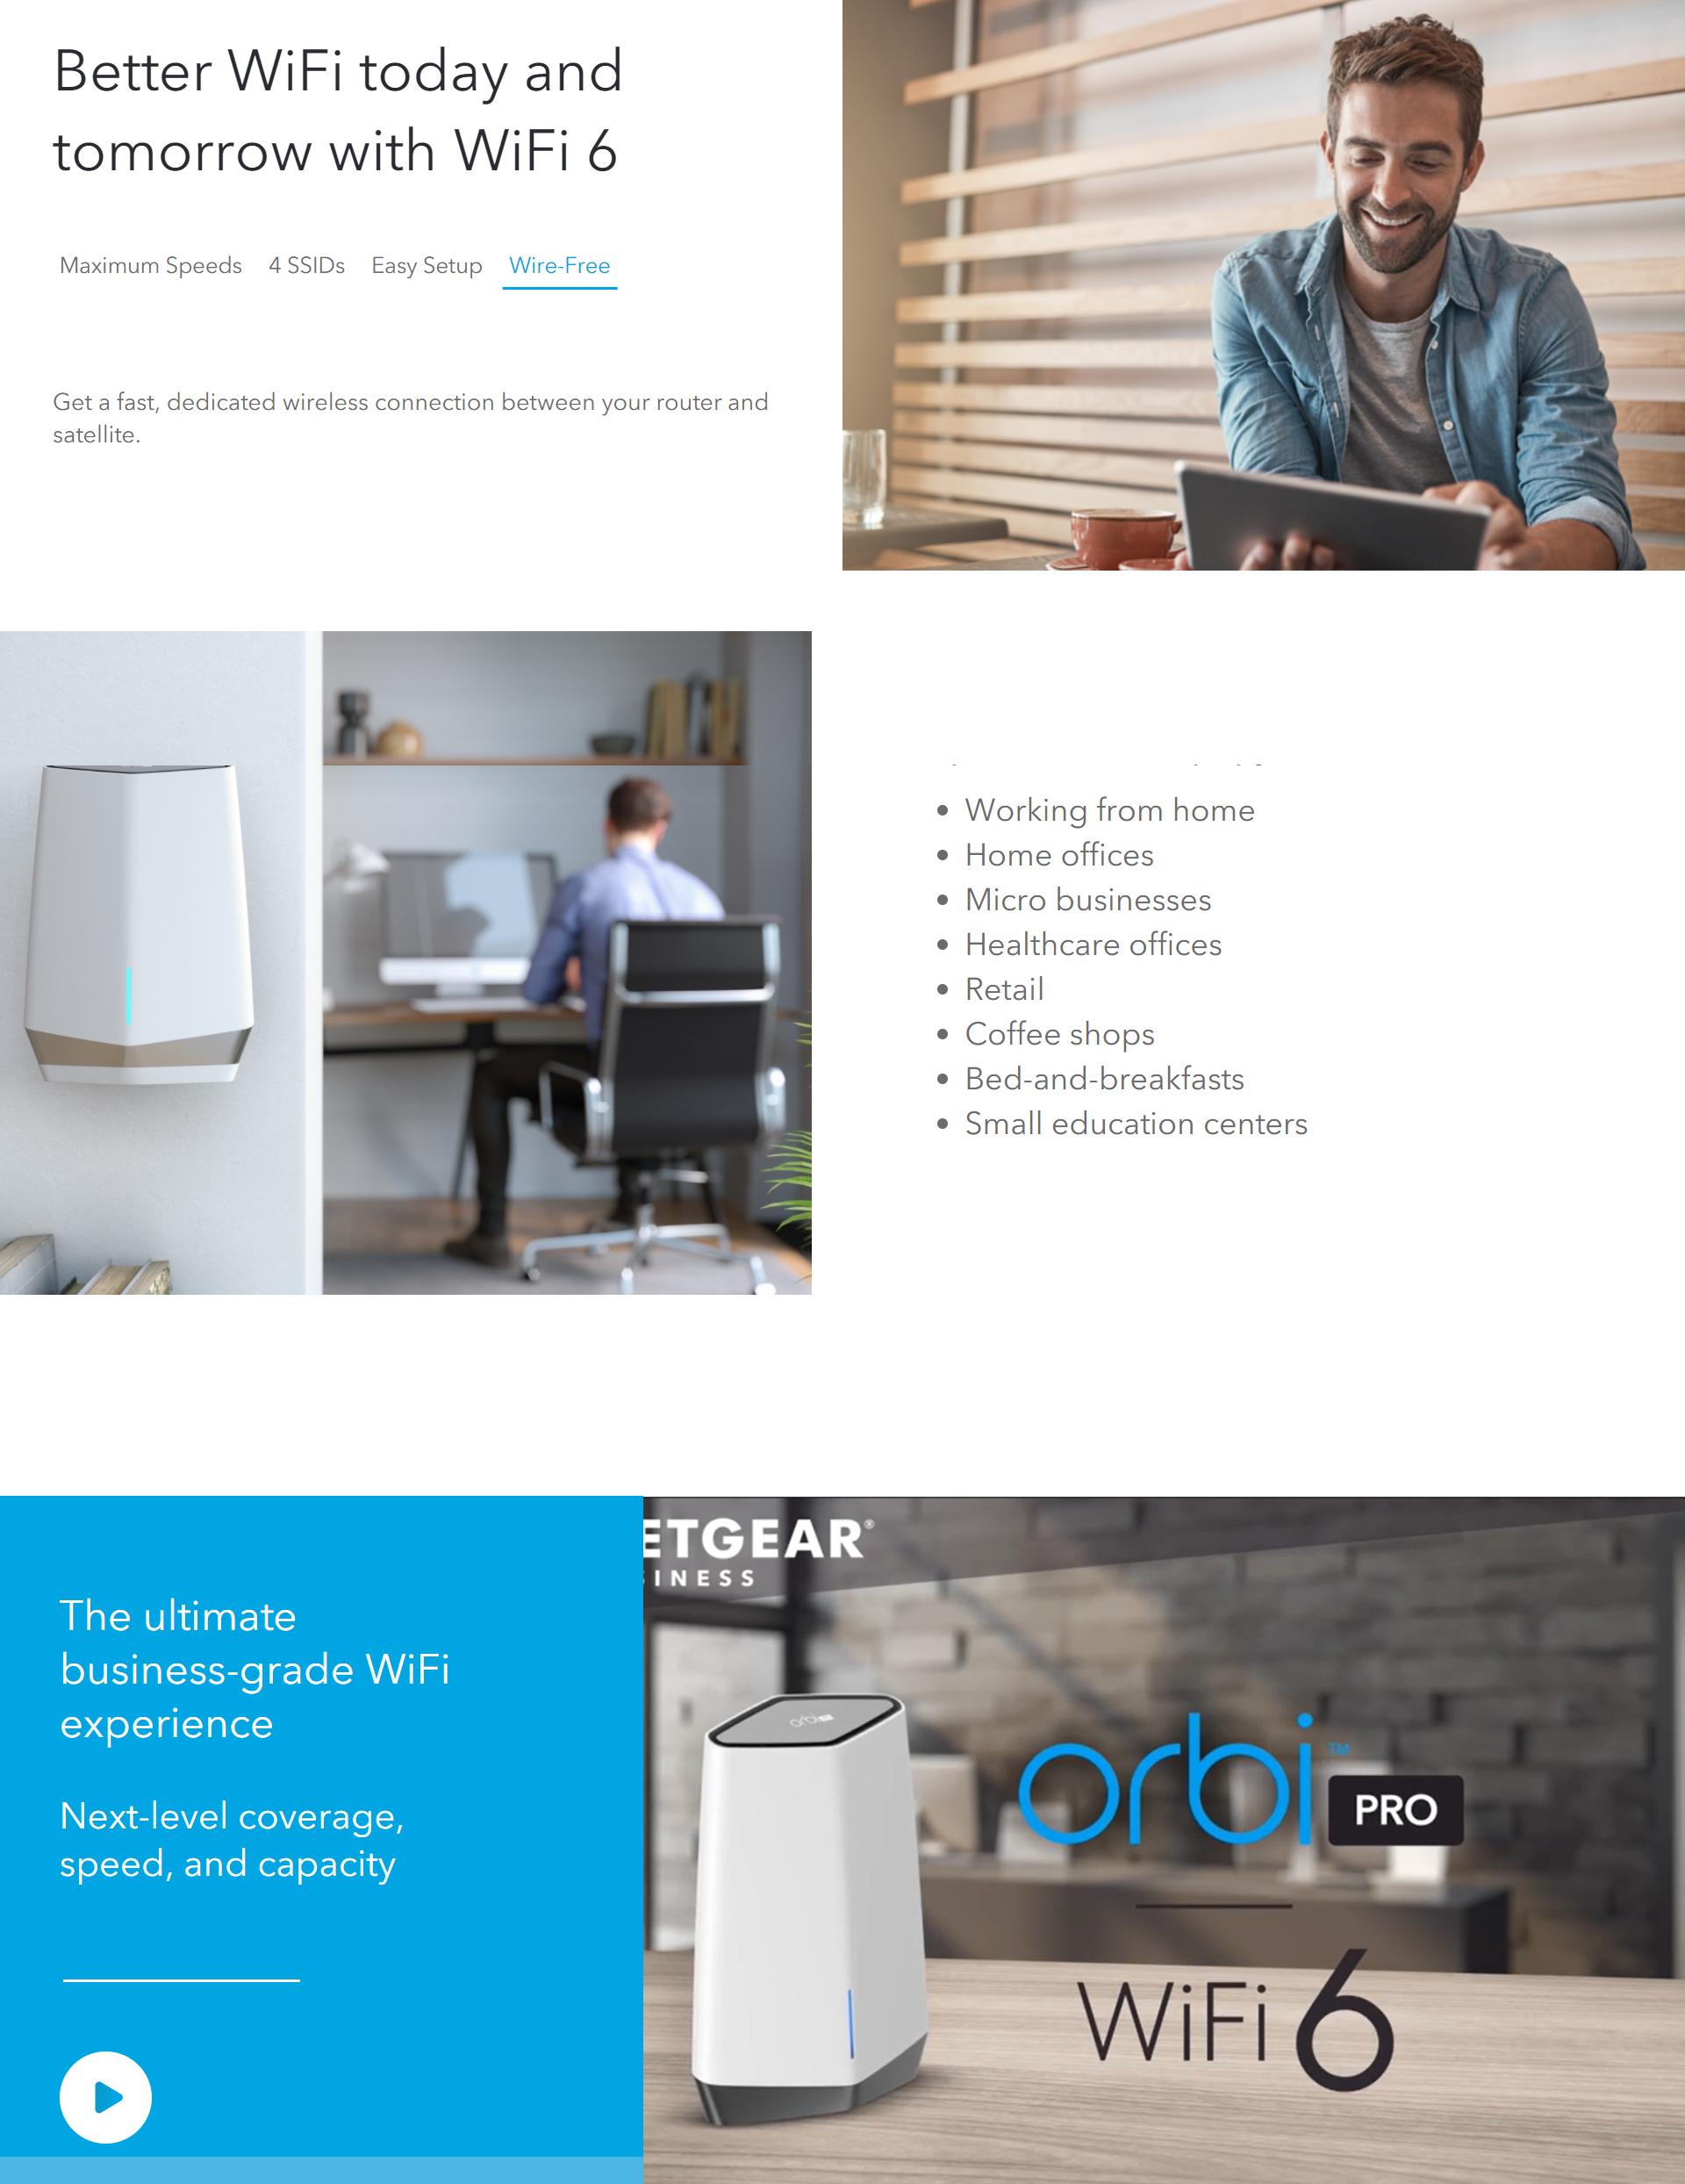 screencapture-netgear-au-orbi-pro-SXK80-aspx-2021-04-23-09_41_50.jpg